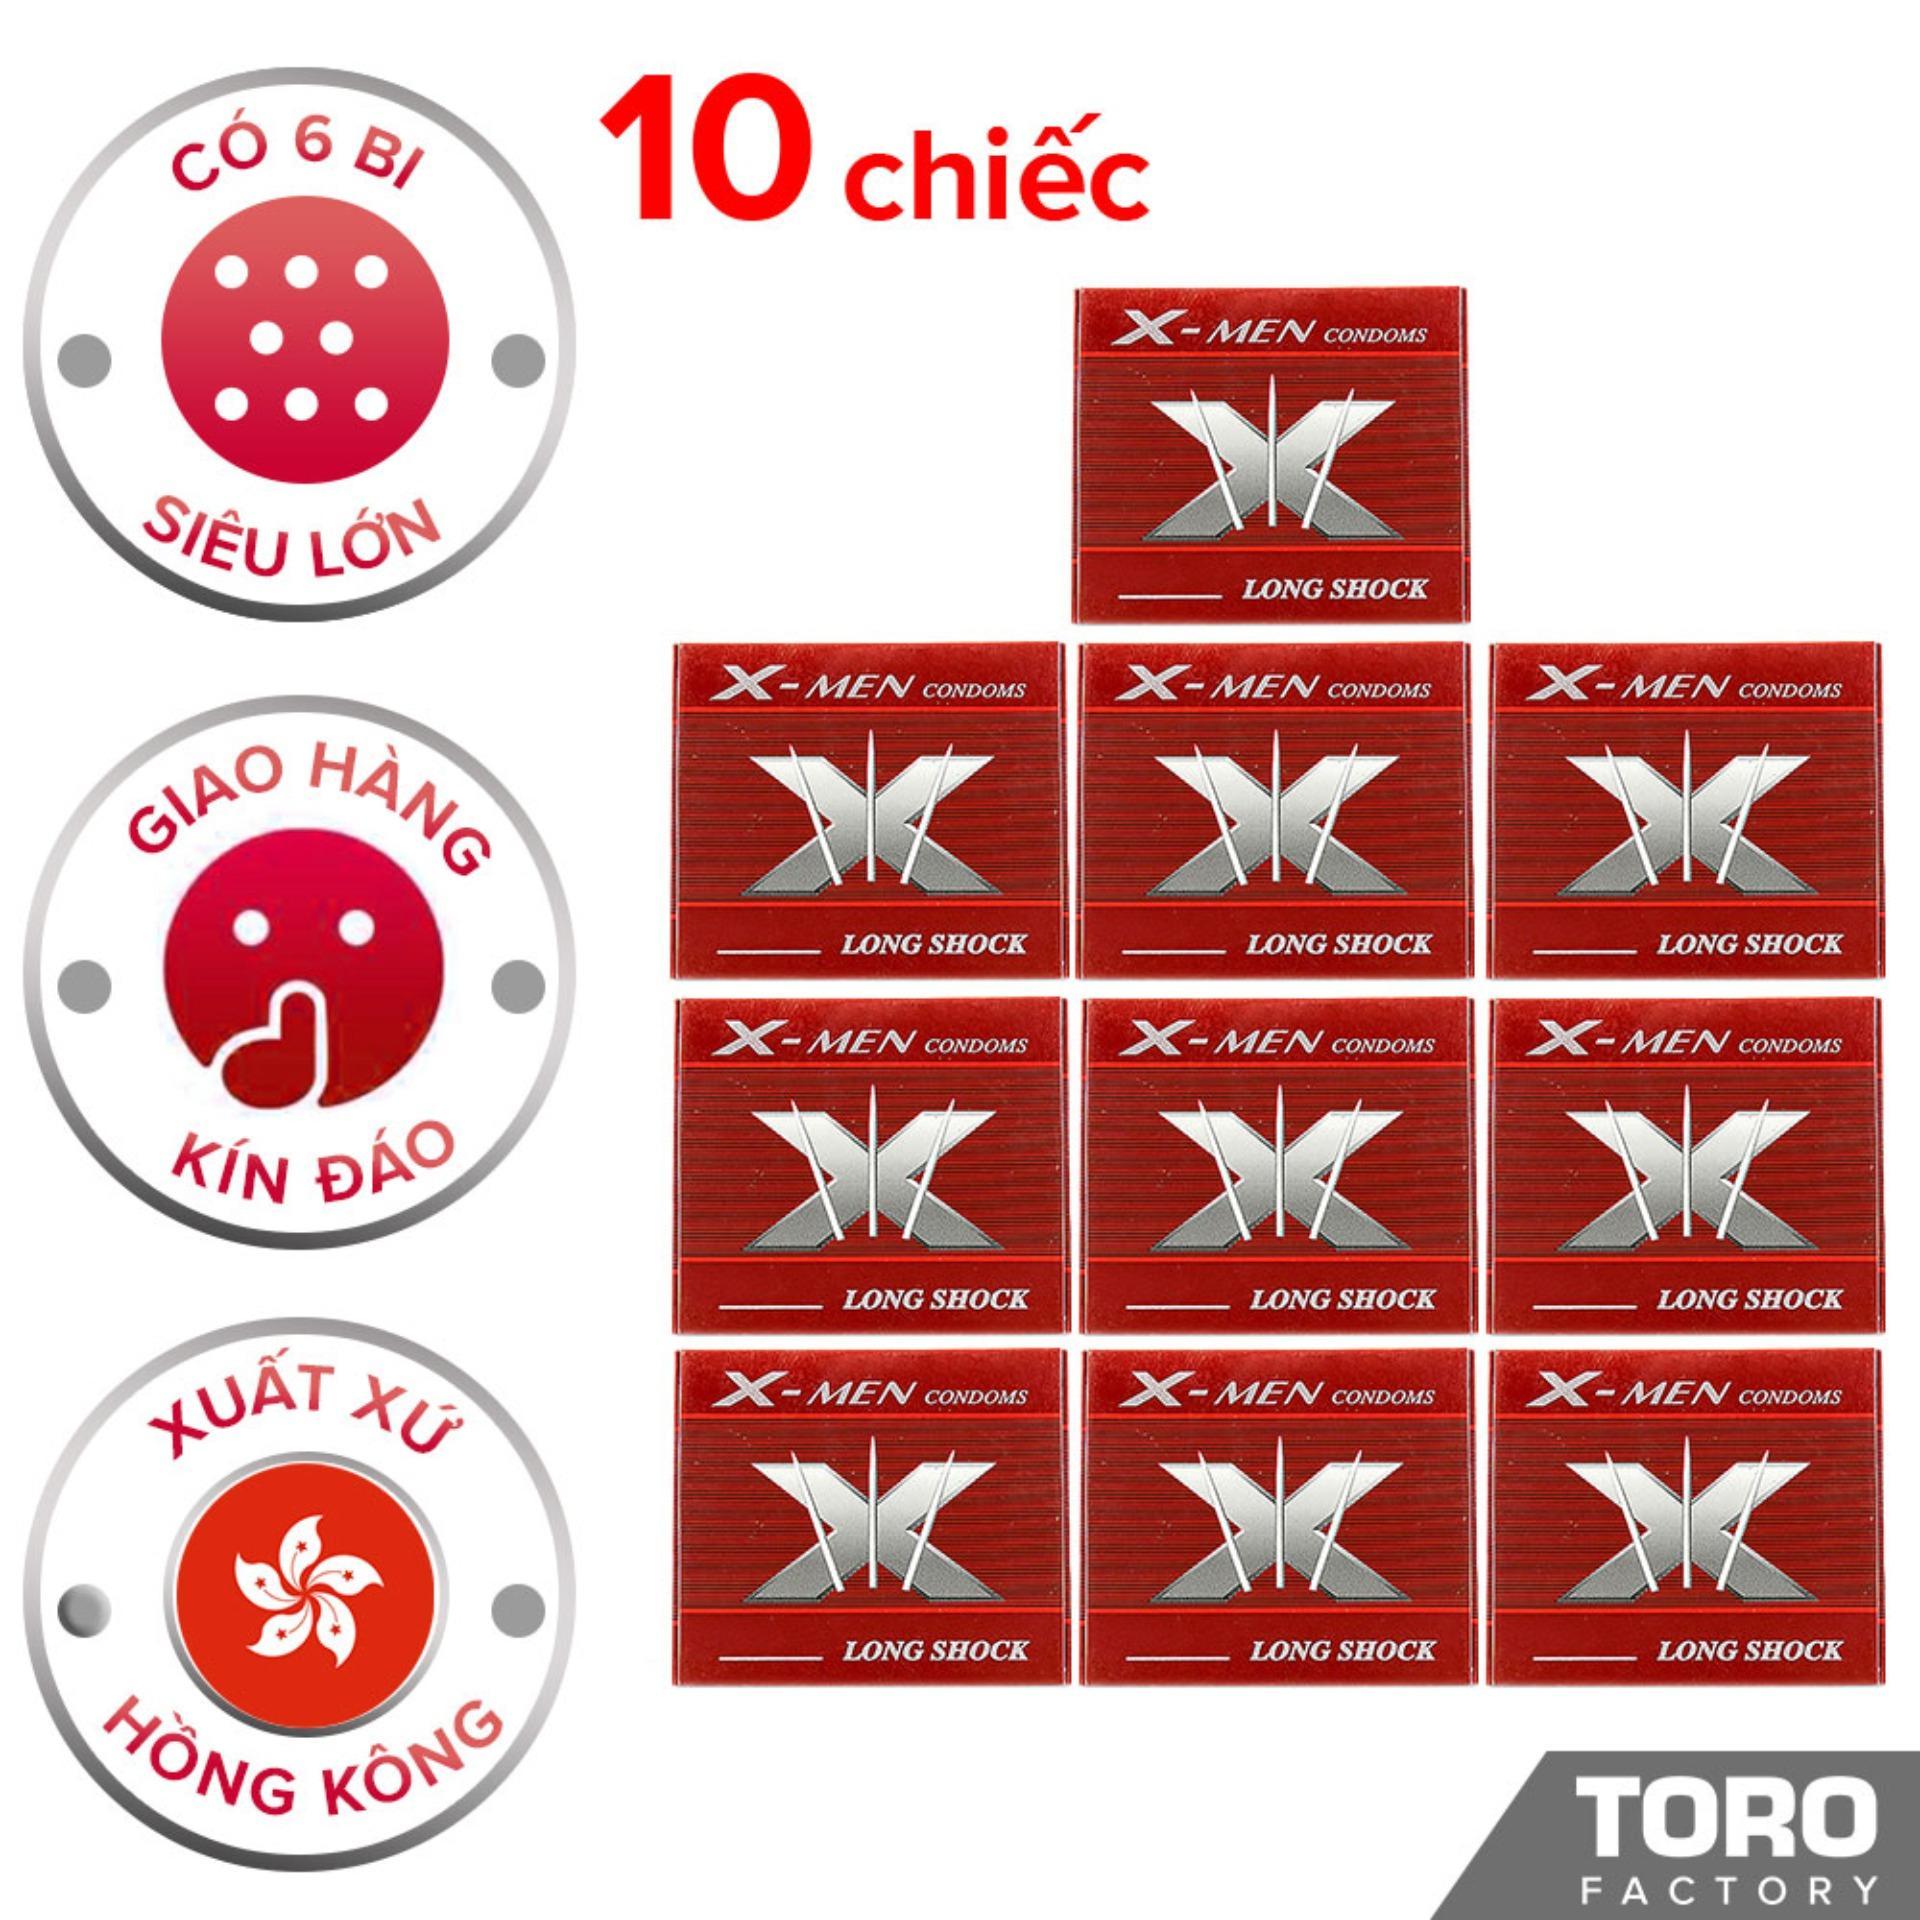 Bộ 10 (10 chiếc) Bao Cao Su Hồng Kông Bi X Bi - ToroShop